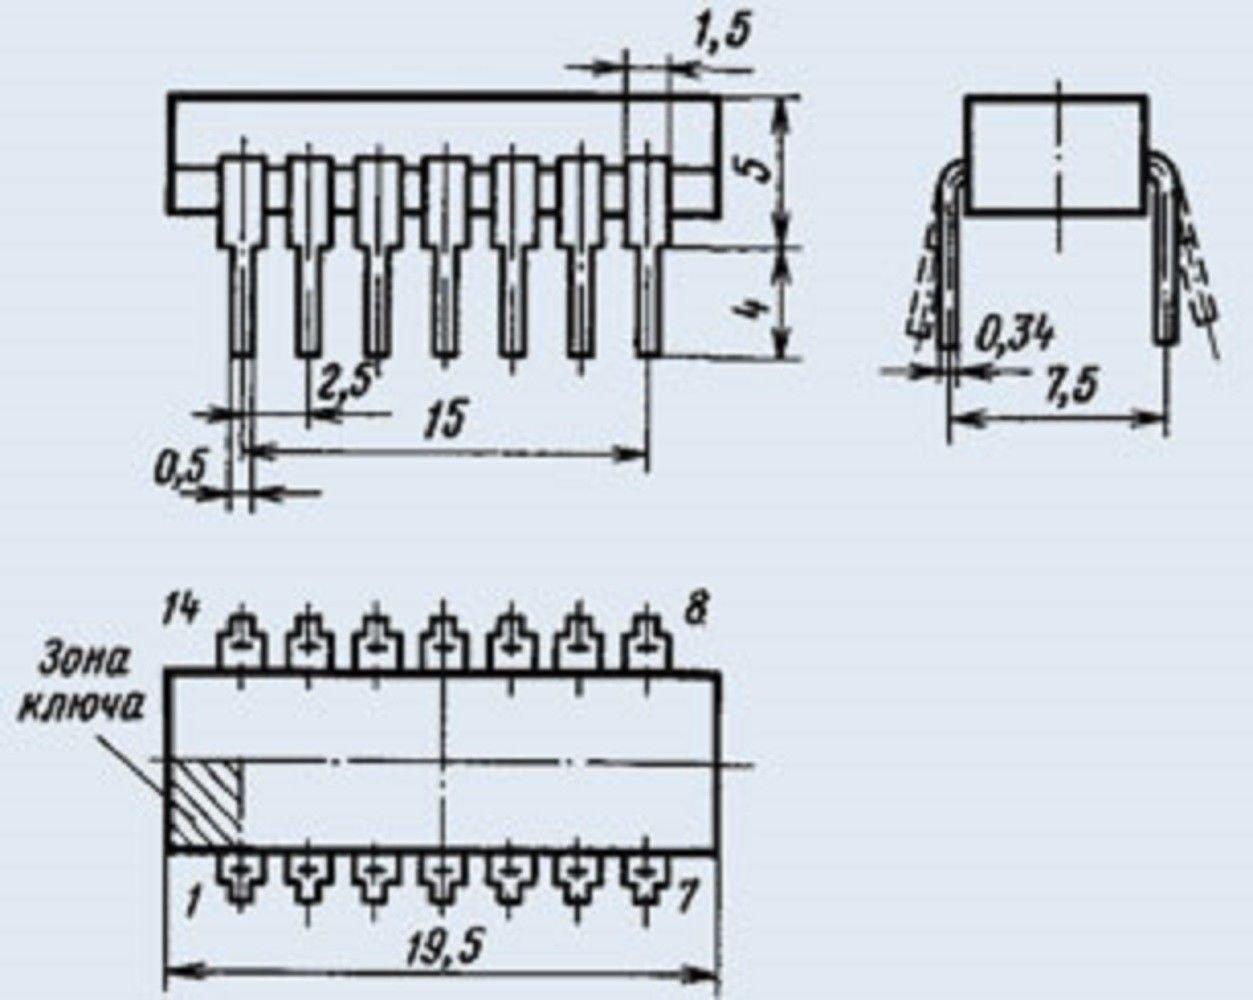 K157HP2 IC Microchip USSR  Lot of 12 pcs